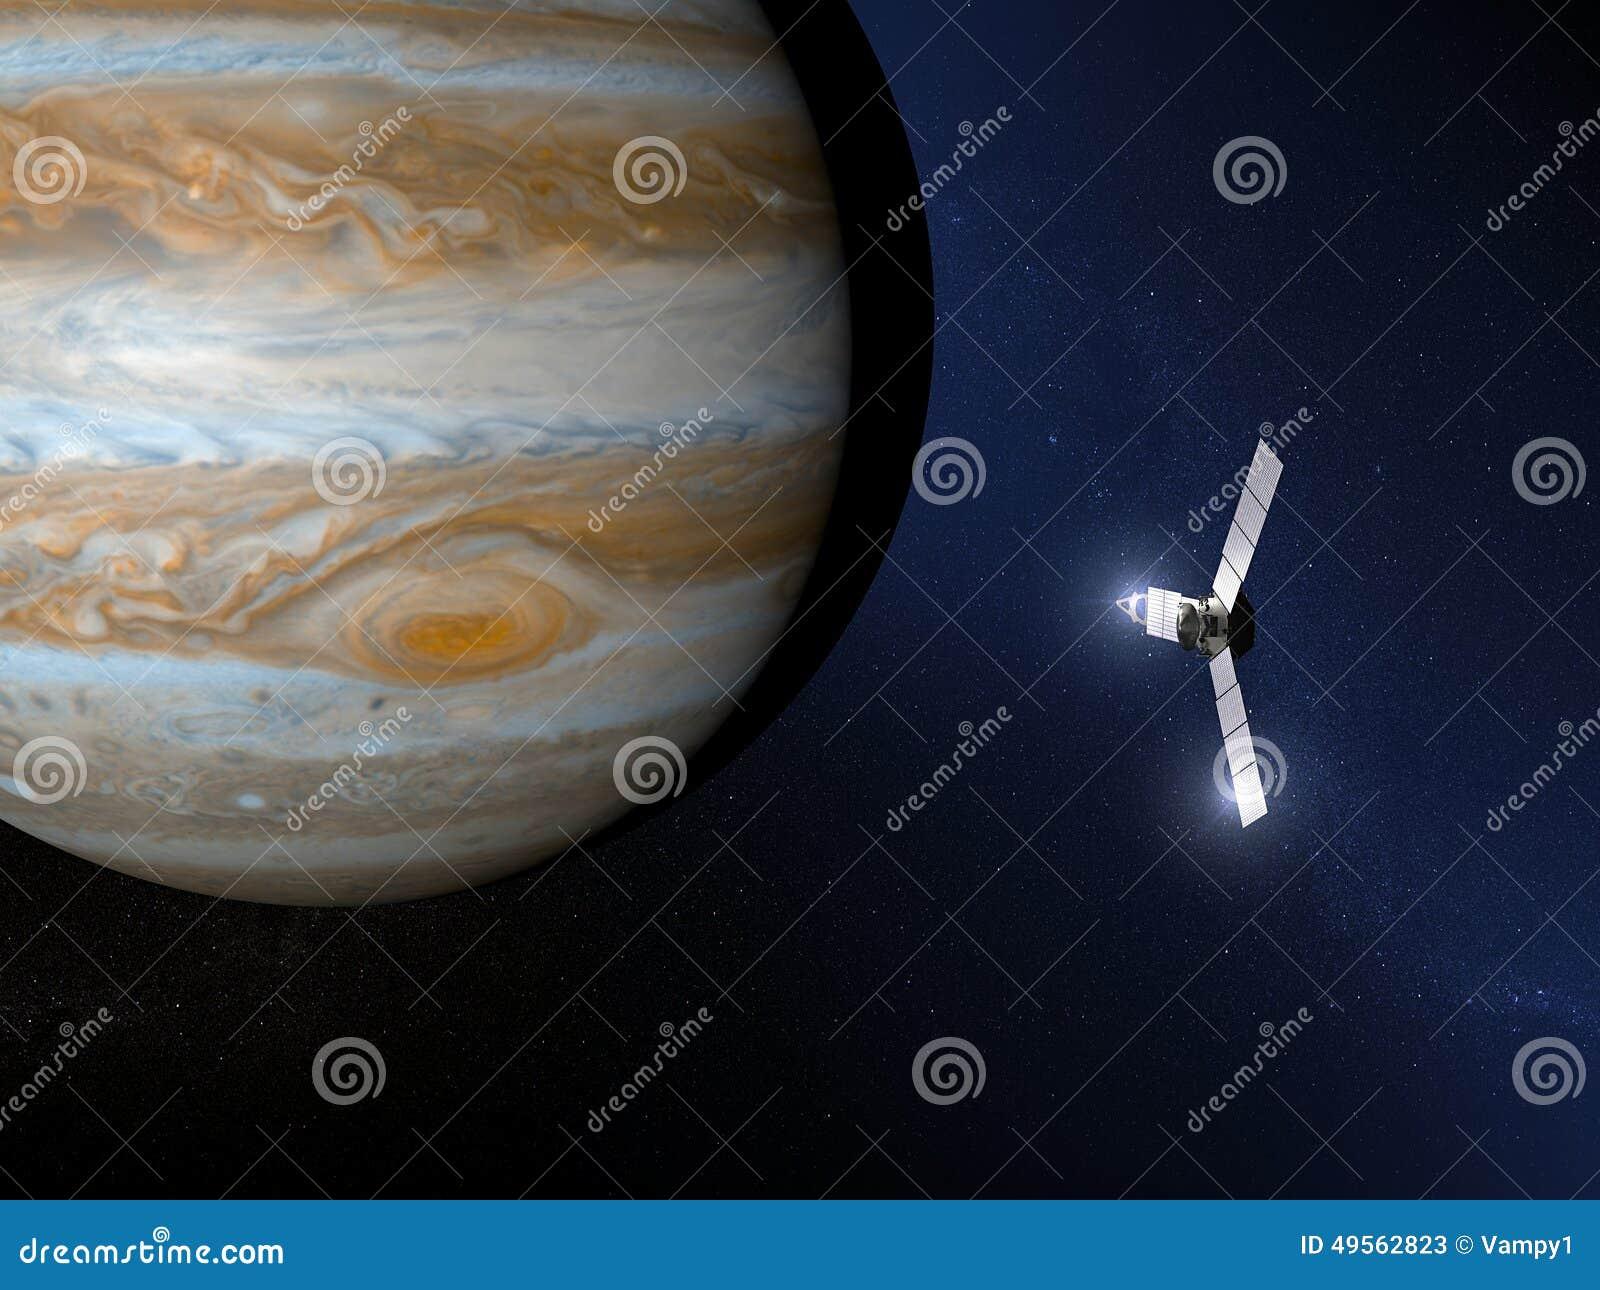 Jupiter And Juno Space Probe Stock Illustration - Image ...